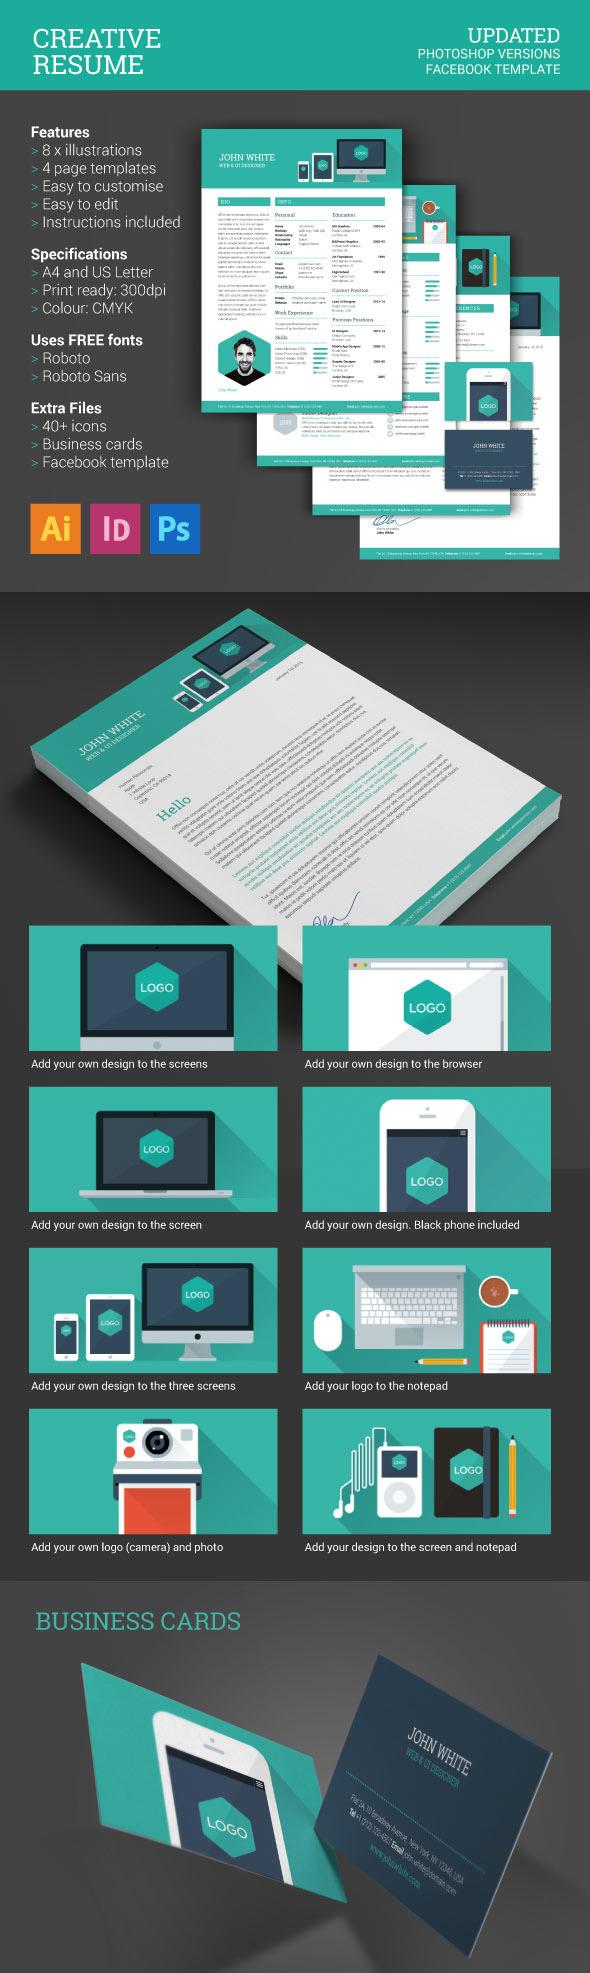 Flat, Minimal Style Creative Resume Design